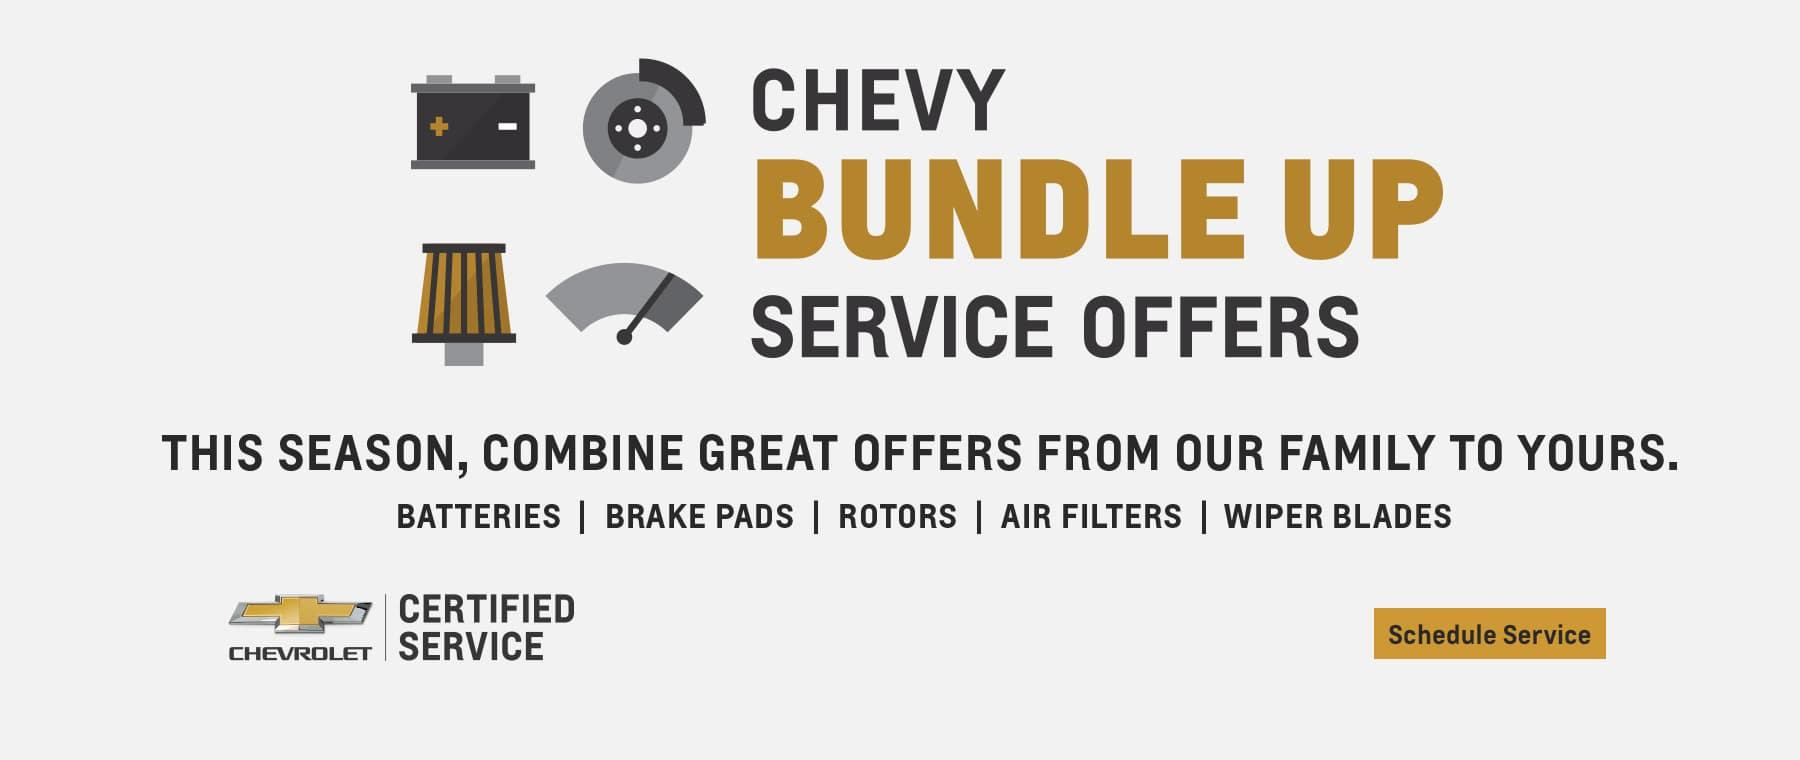 bundle up service offers